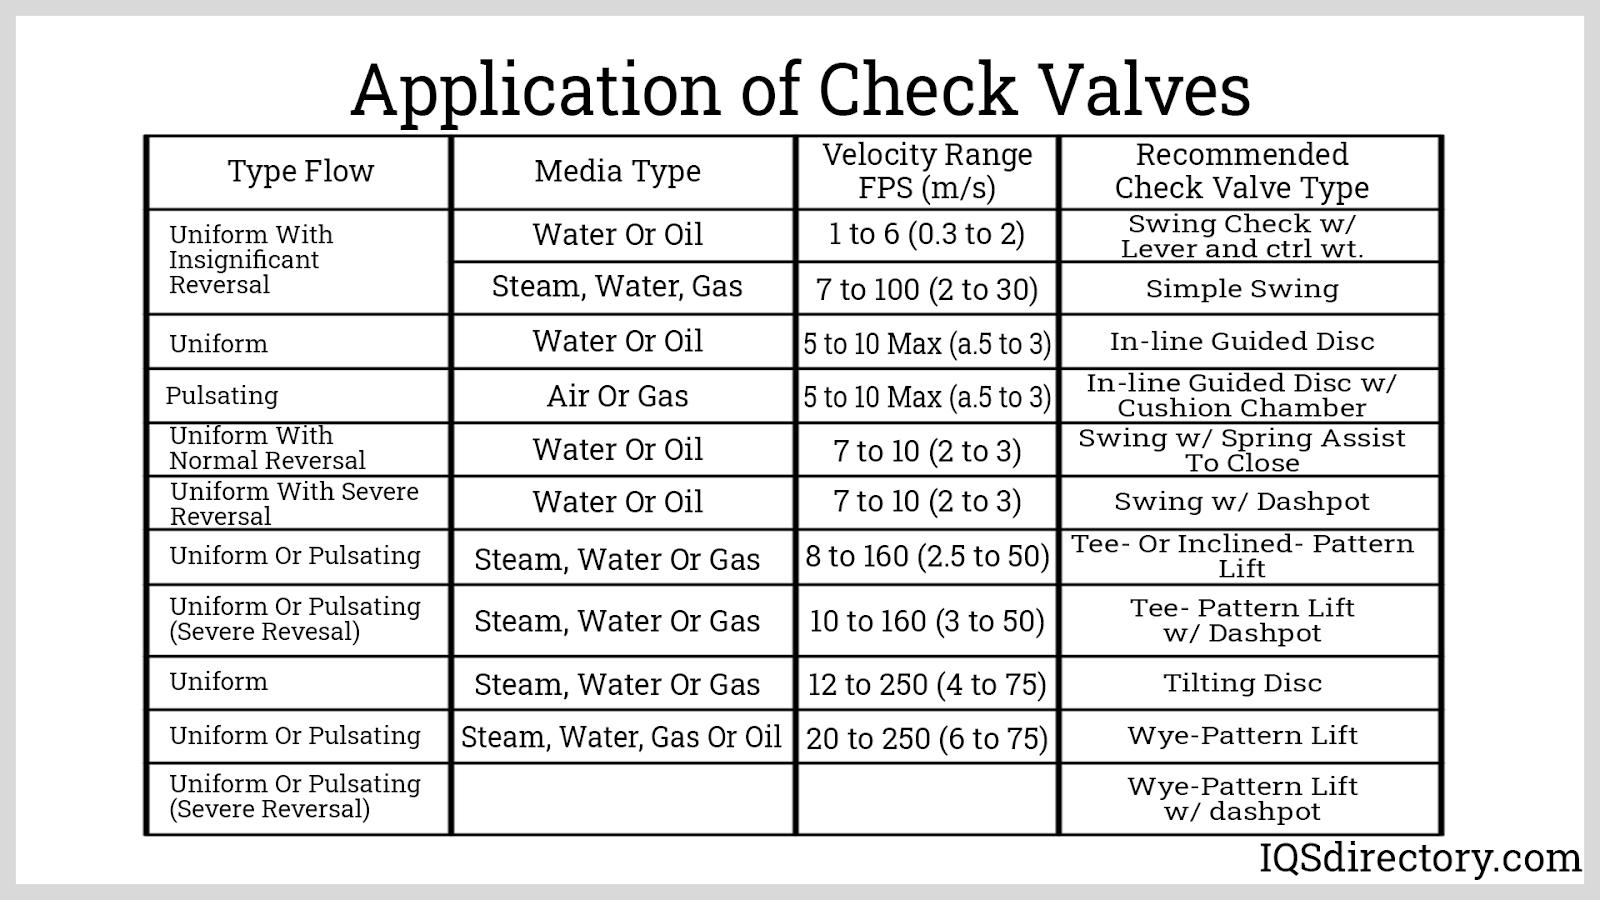 Application of Check Valves